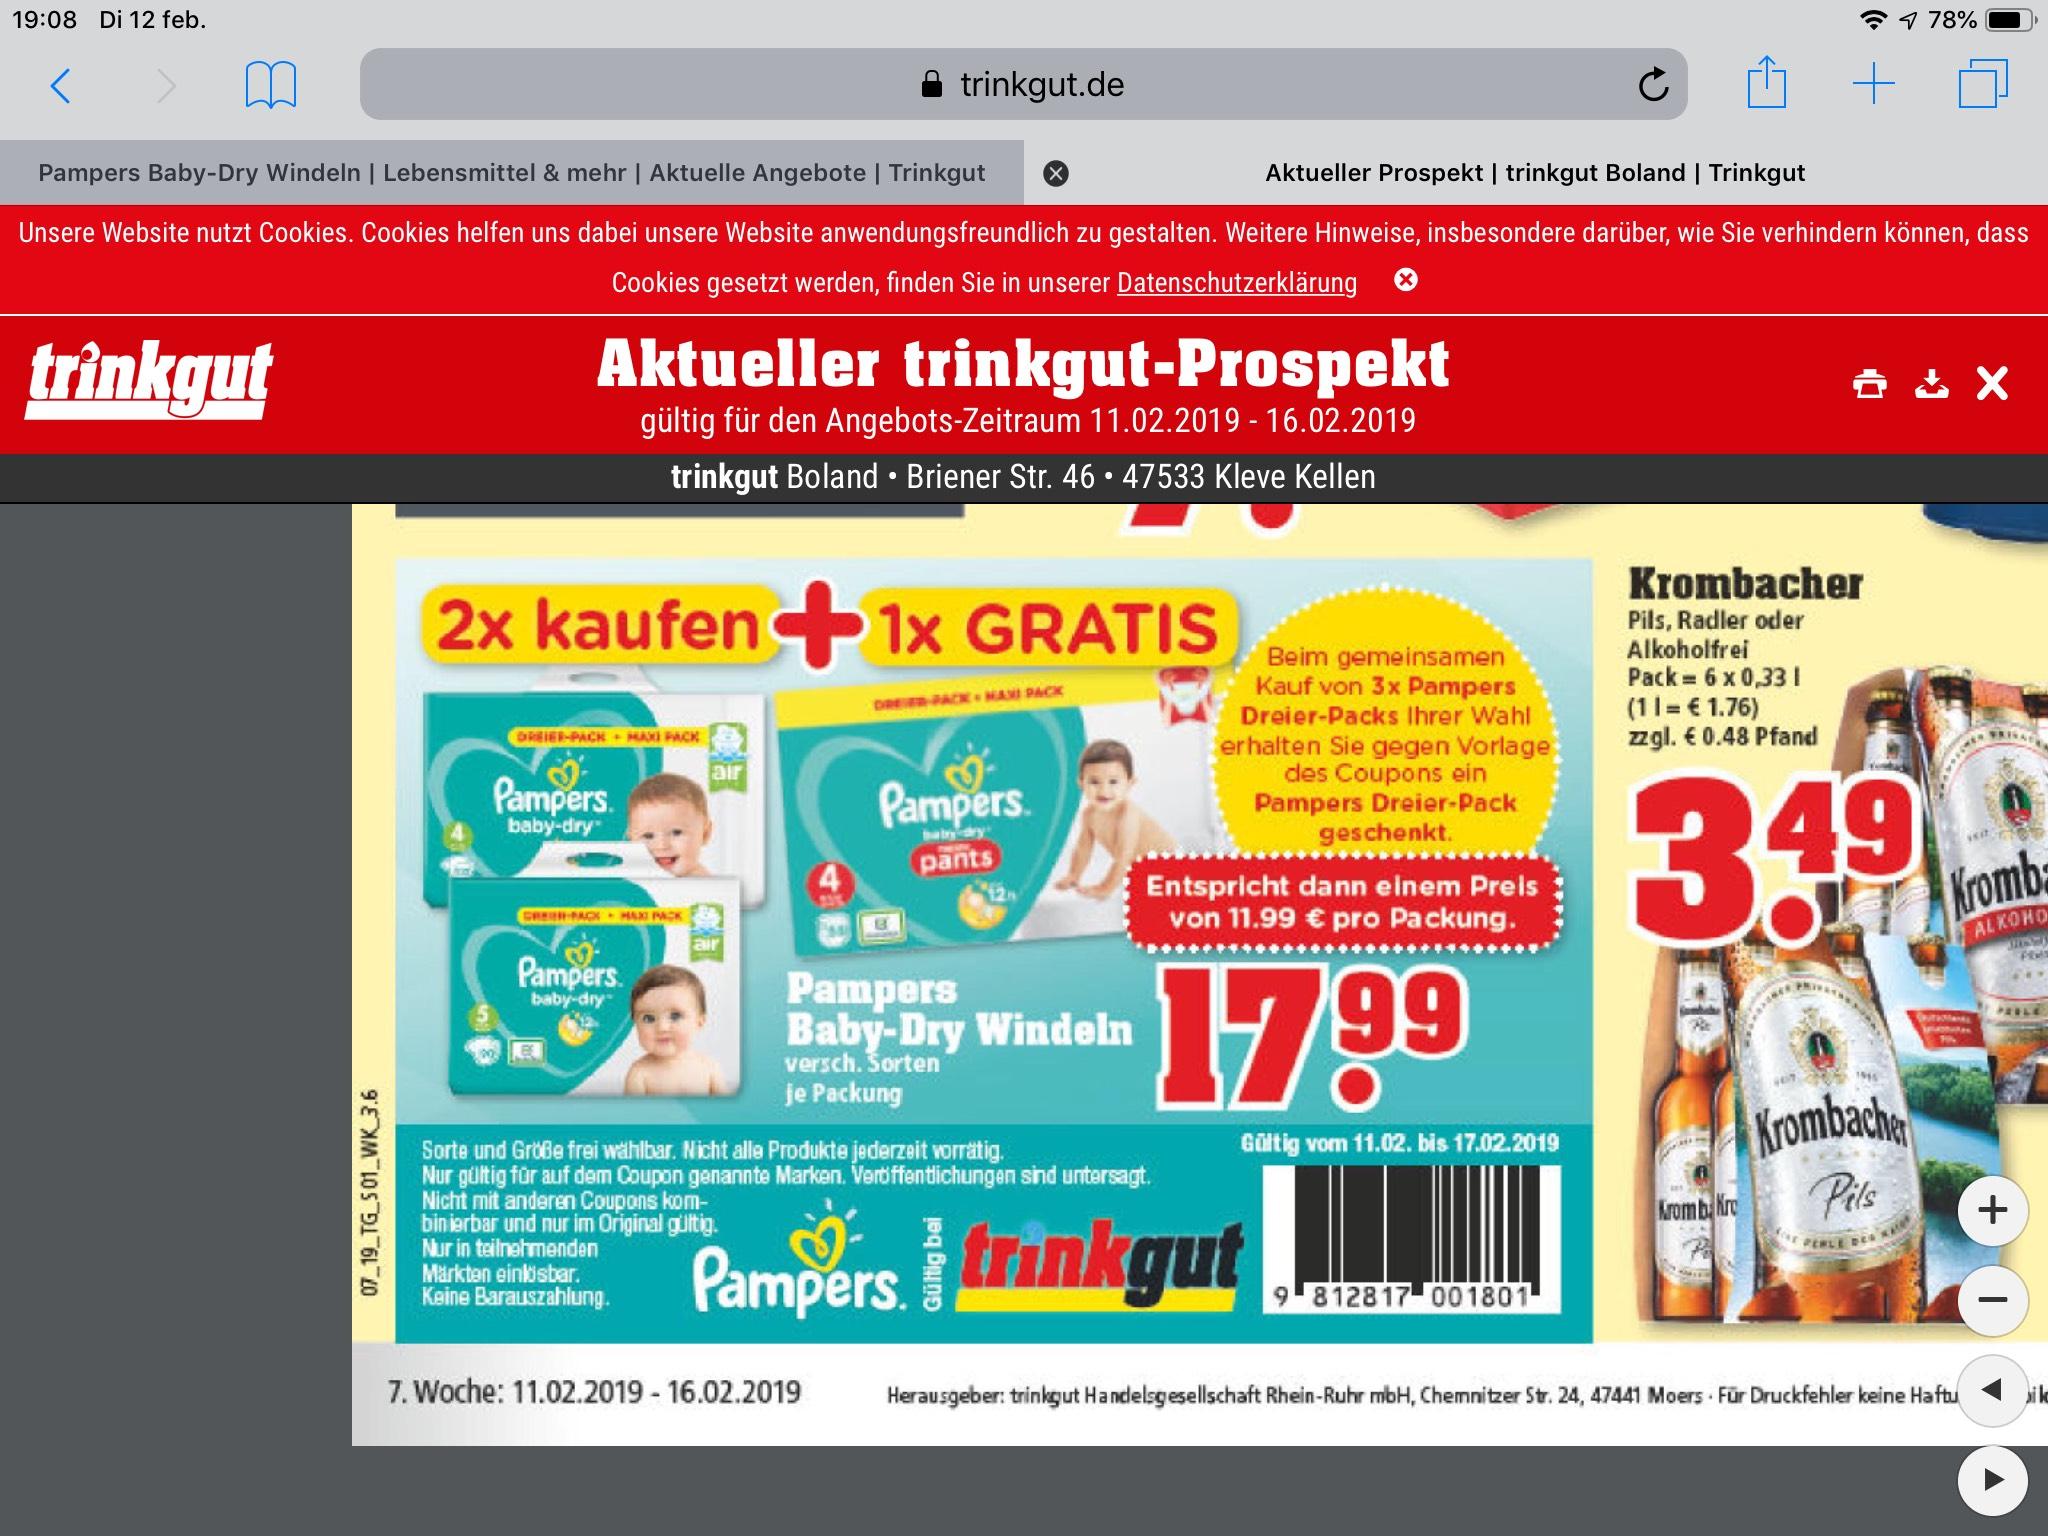 (Grens deal). 264 pampers  maat 4 pants... voor 35,98 = 1 pack a 88 stuks gratis.